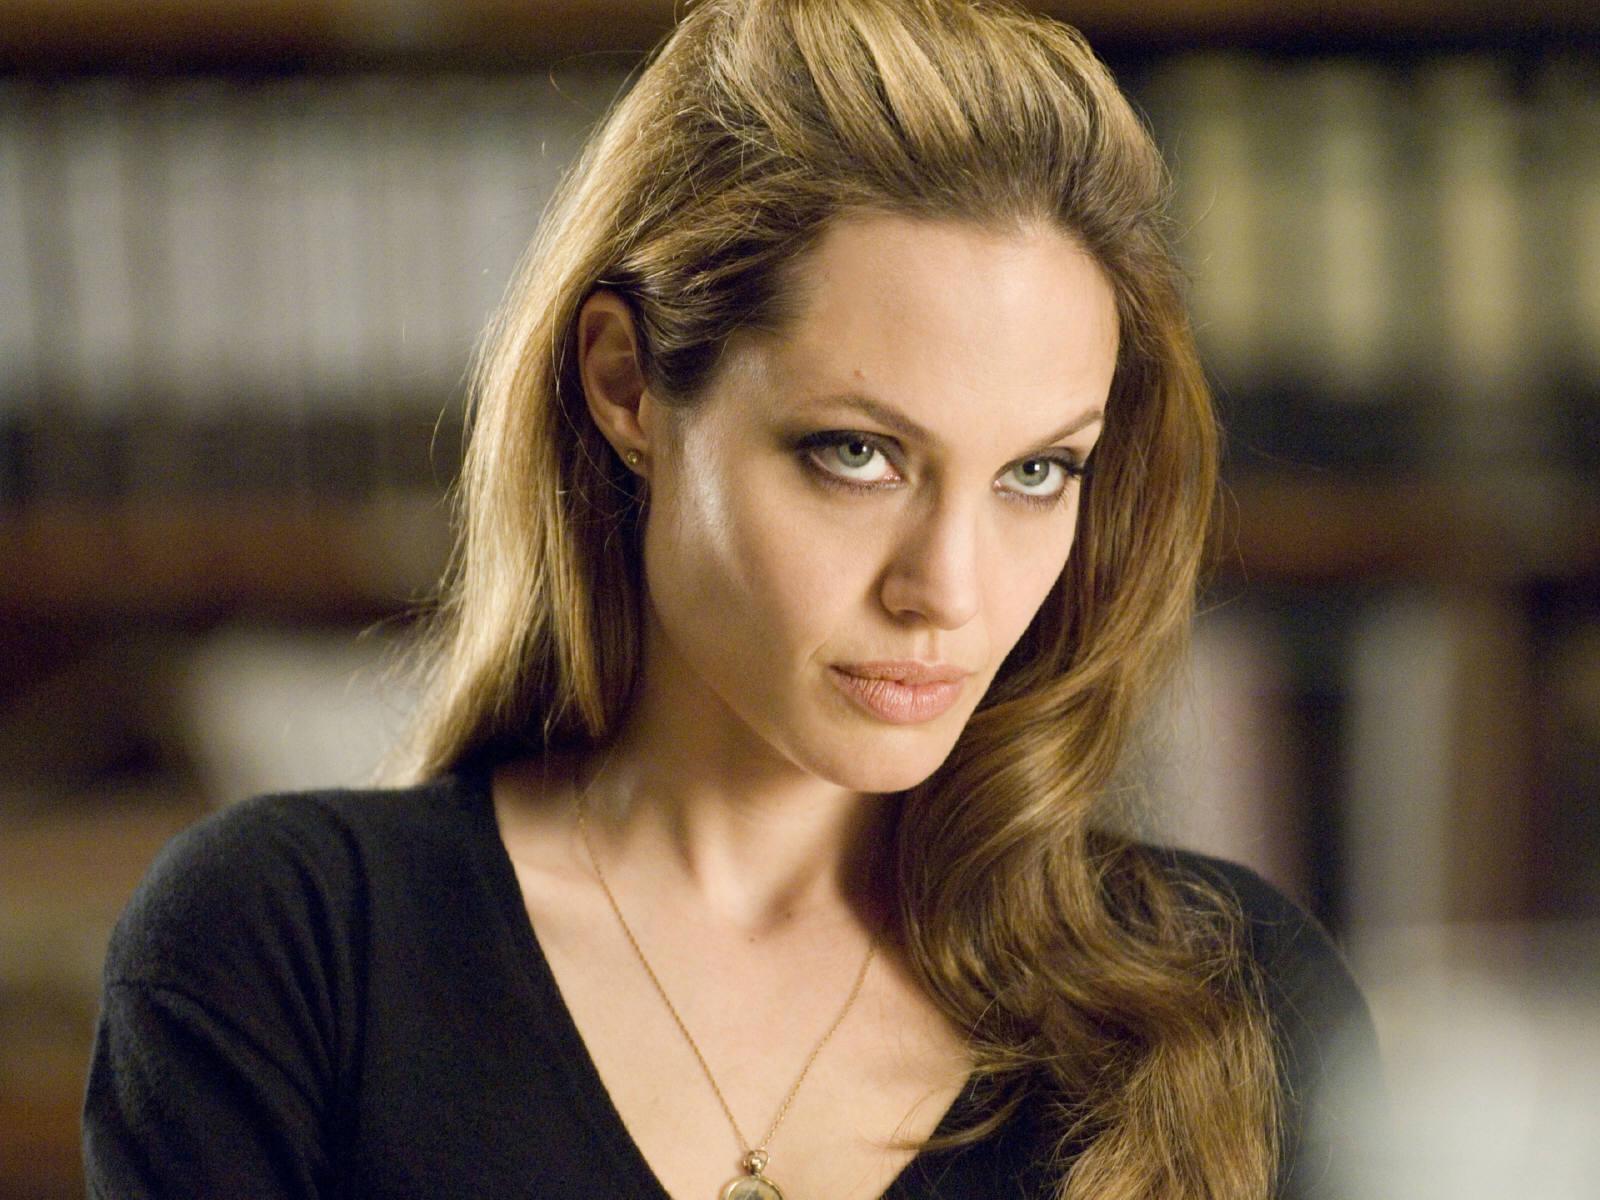 Angelina Jolie Hd Wallpapers: 19 Beautiful HD Angelina Jolie Wallpapers